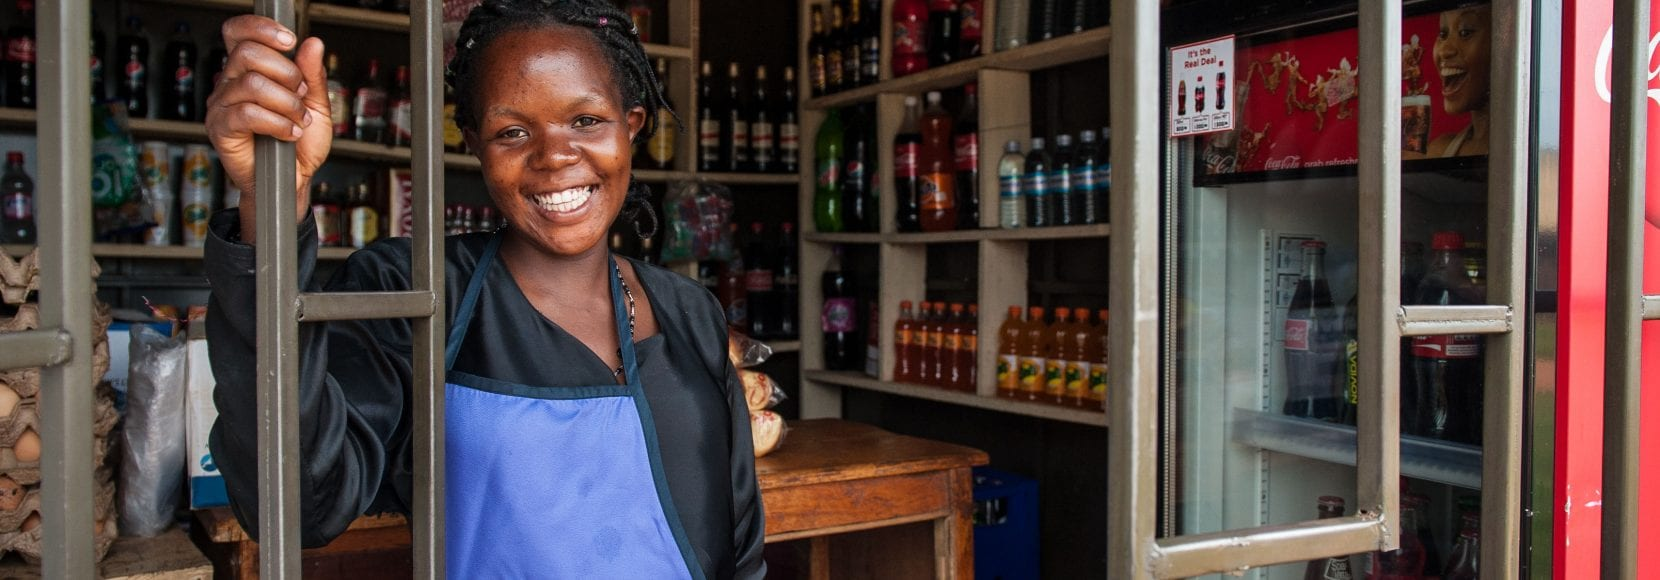 Woman smiling in her store in Uganda